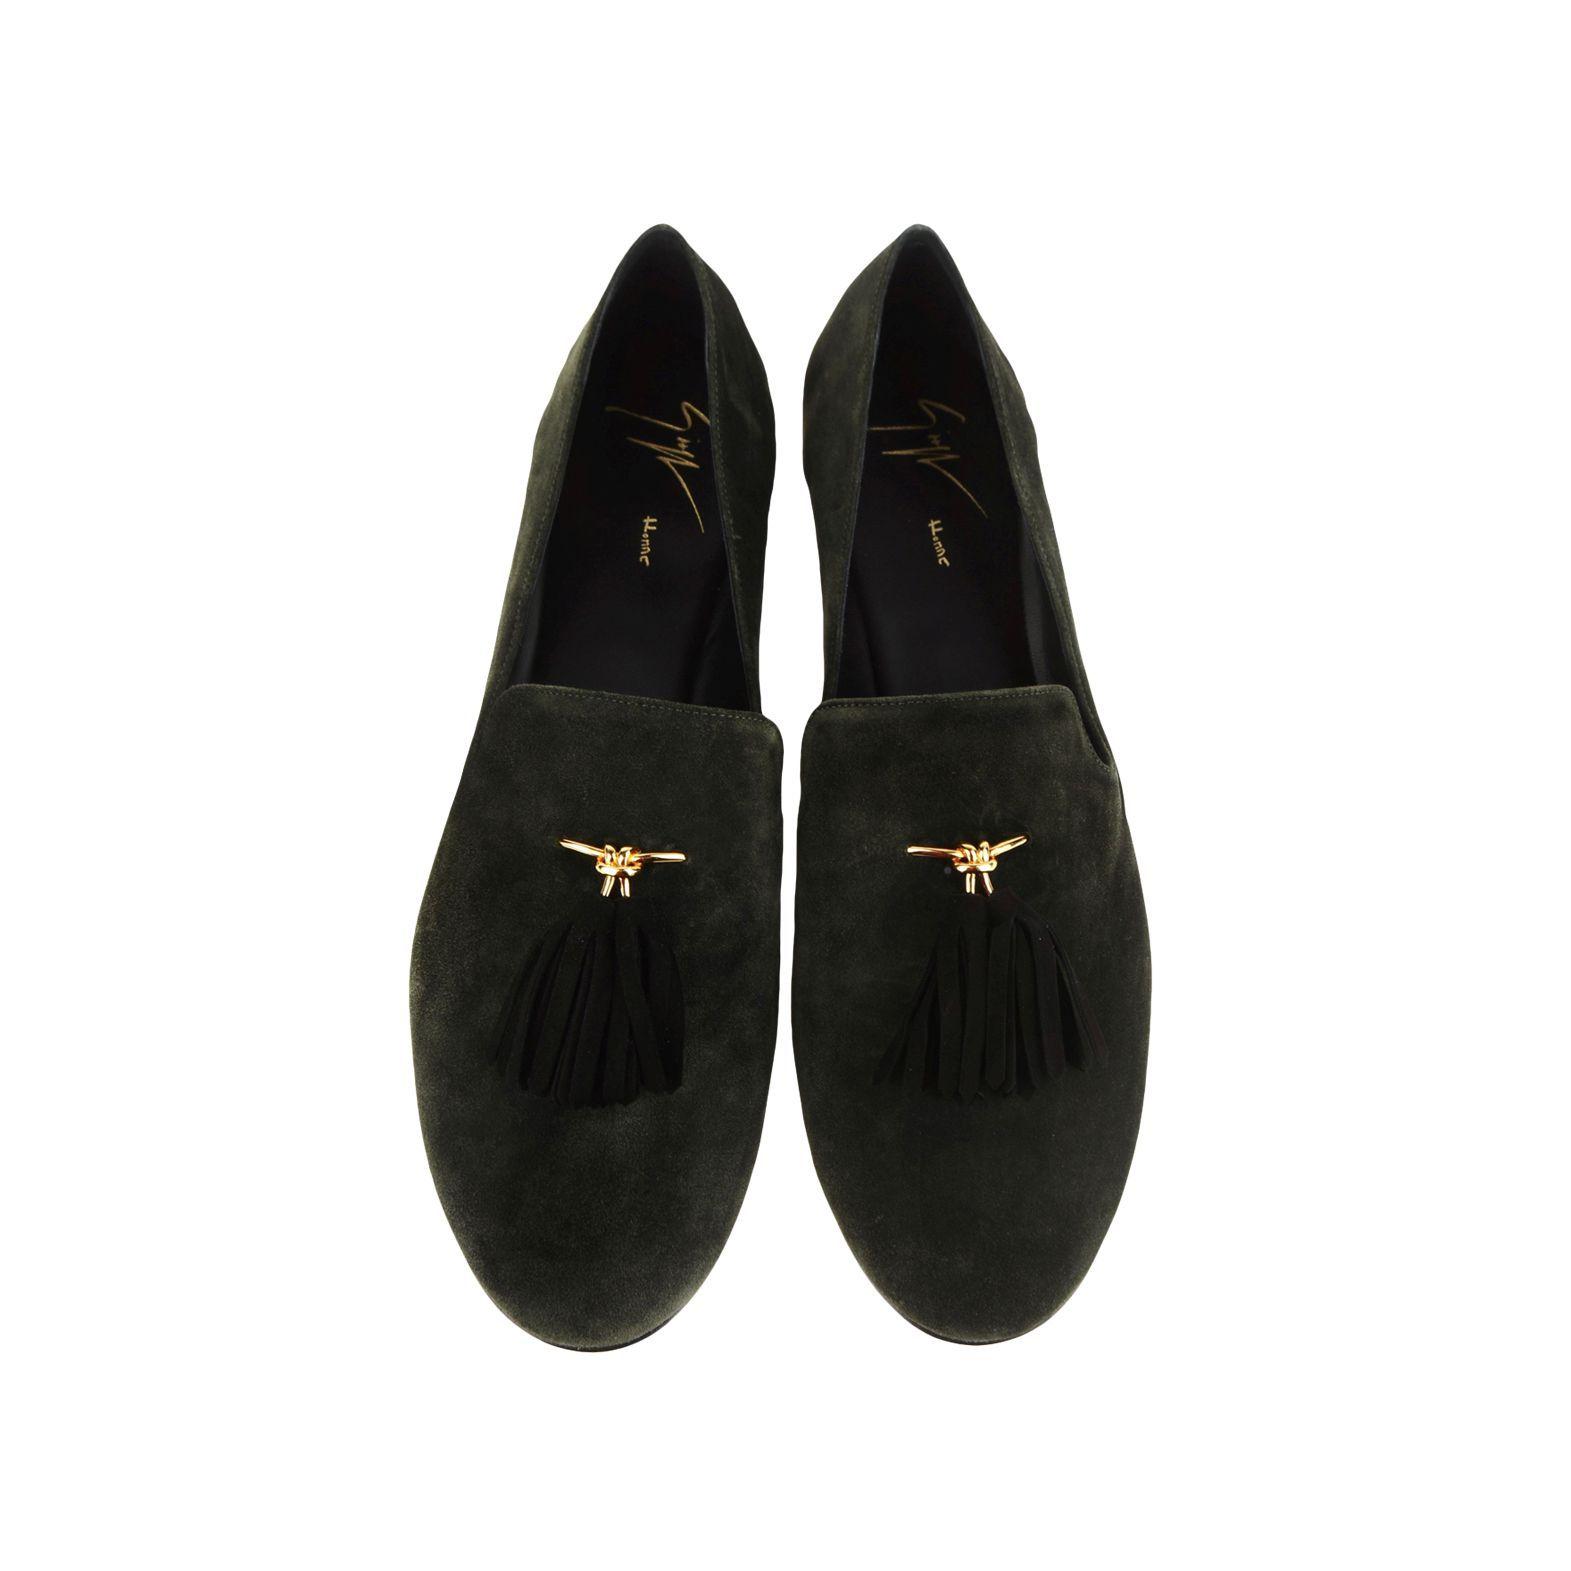 6df9429c7573c Giuseppe Zanotti Men's Shoes, Giuseppe Zanotti, Loafers, Man Shoes, Male  Shoes,